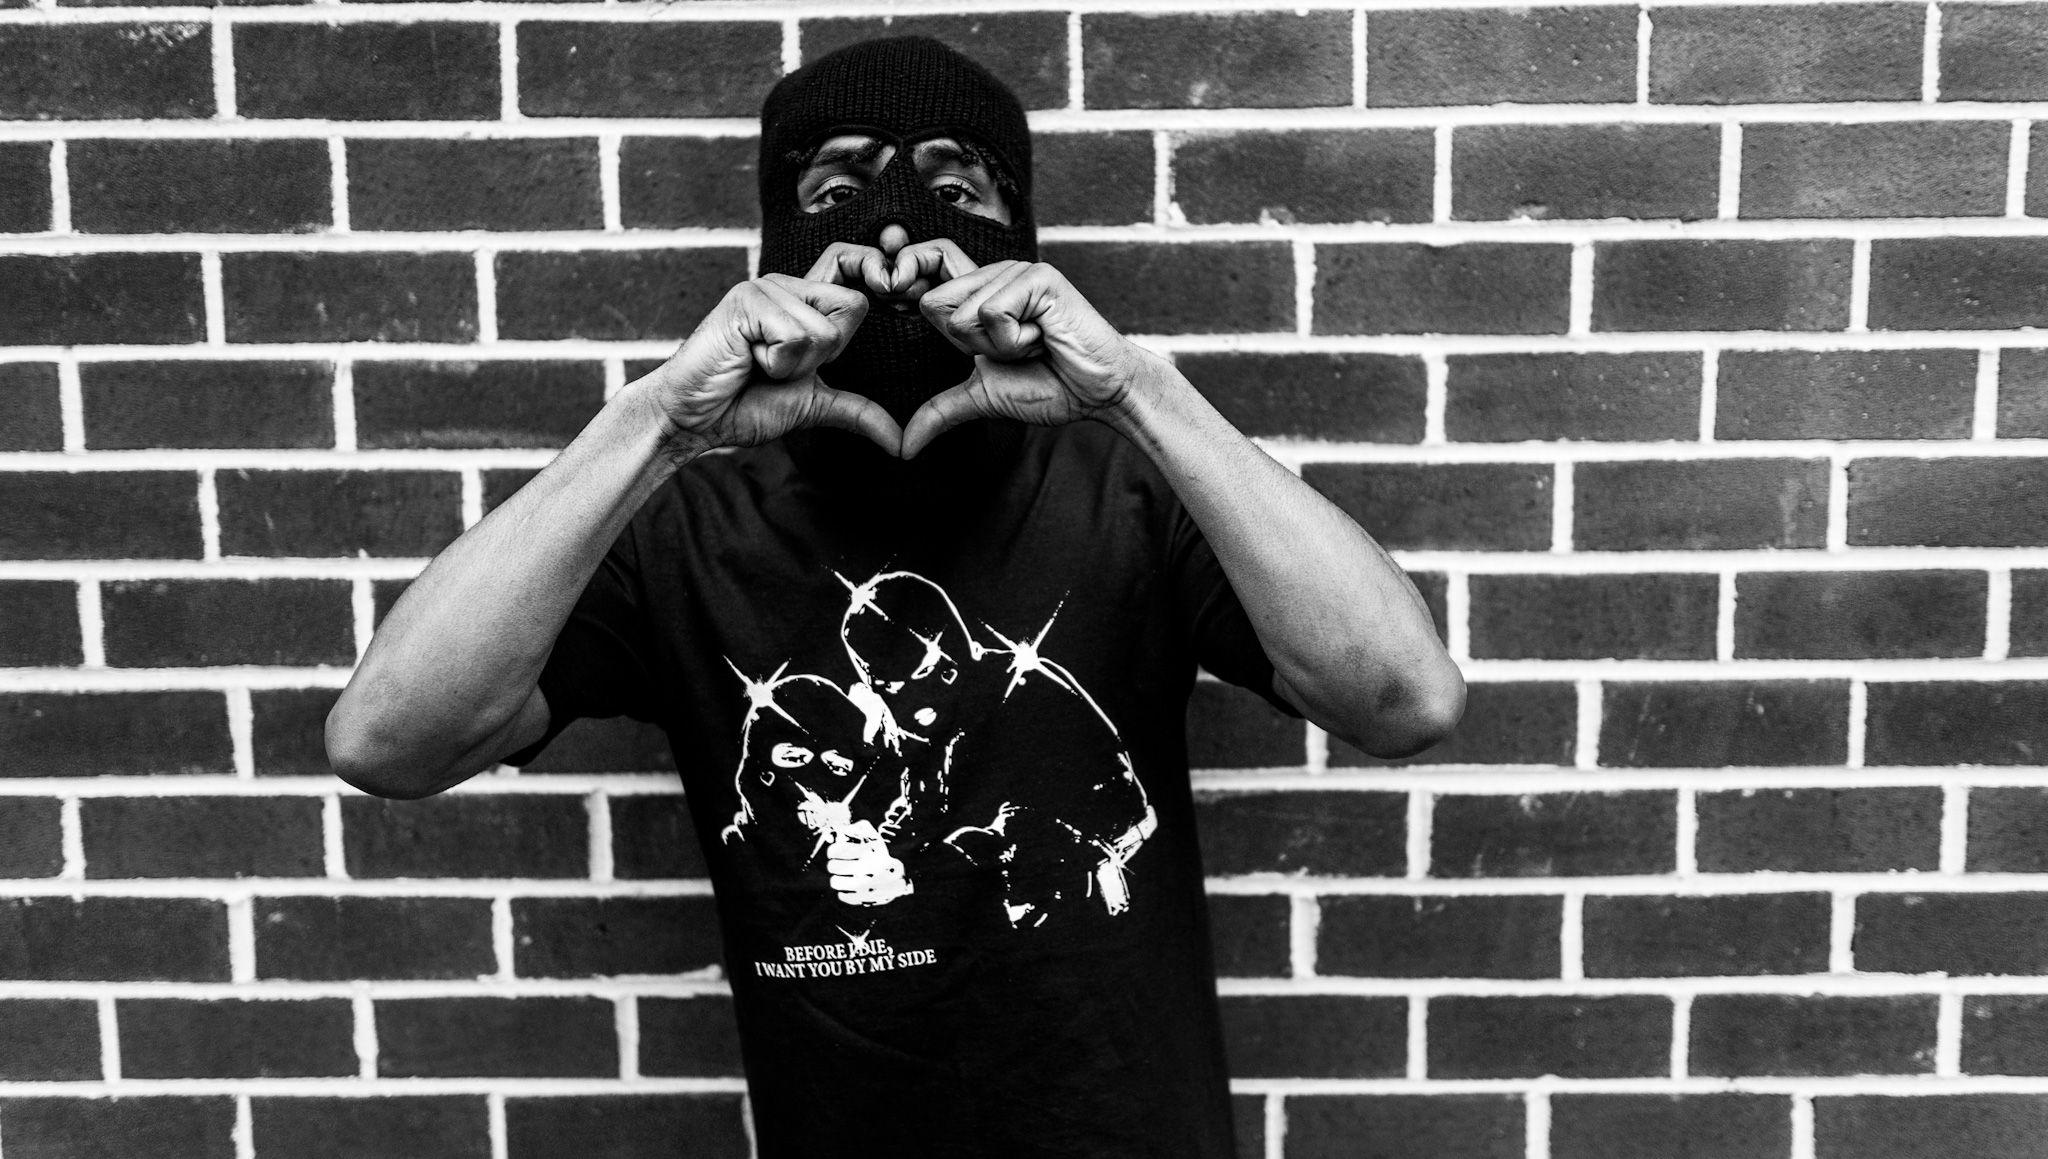 IG: Fullclipoflove 🖤 #streetstyle #dmv #clothingline #lovequotes #loveyourself